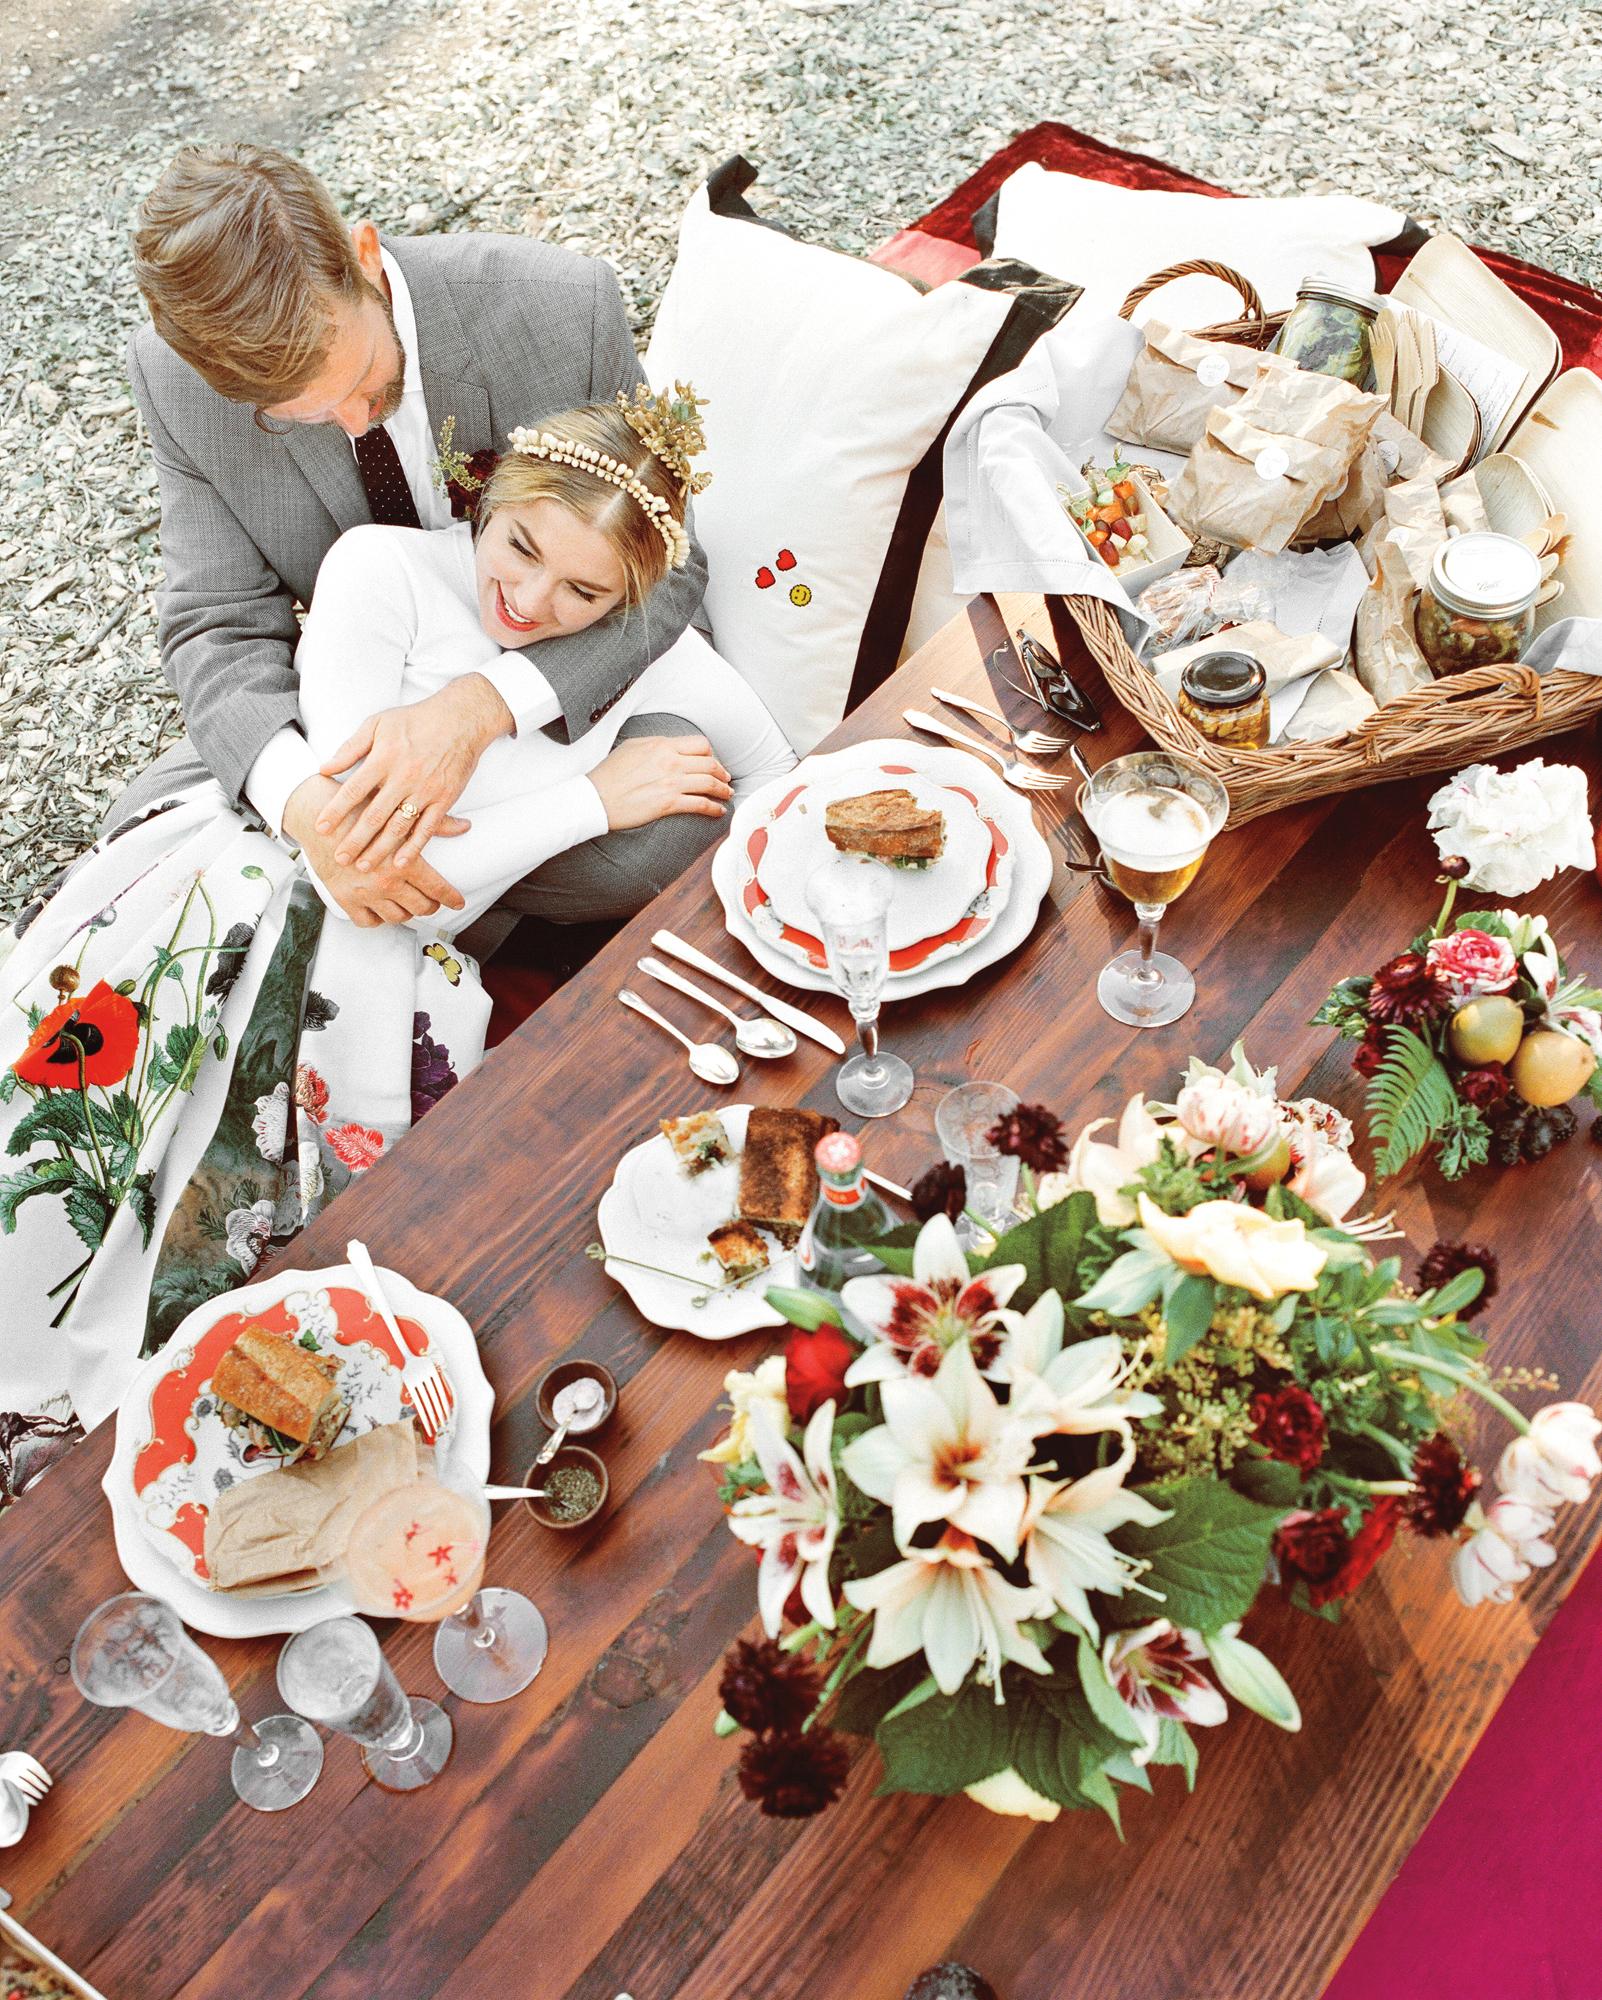 petra-marc-wedding-santa-barbara-0806-s111812.jpg